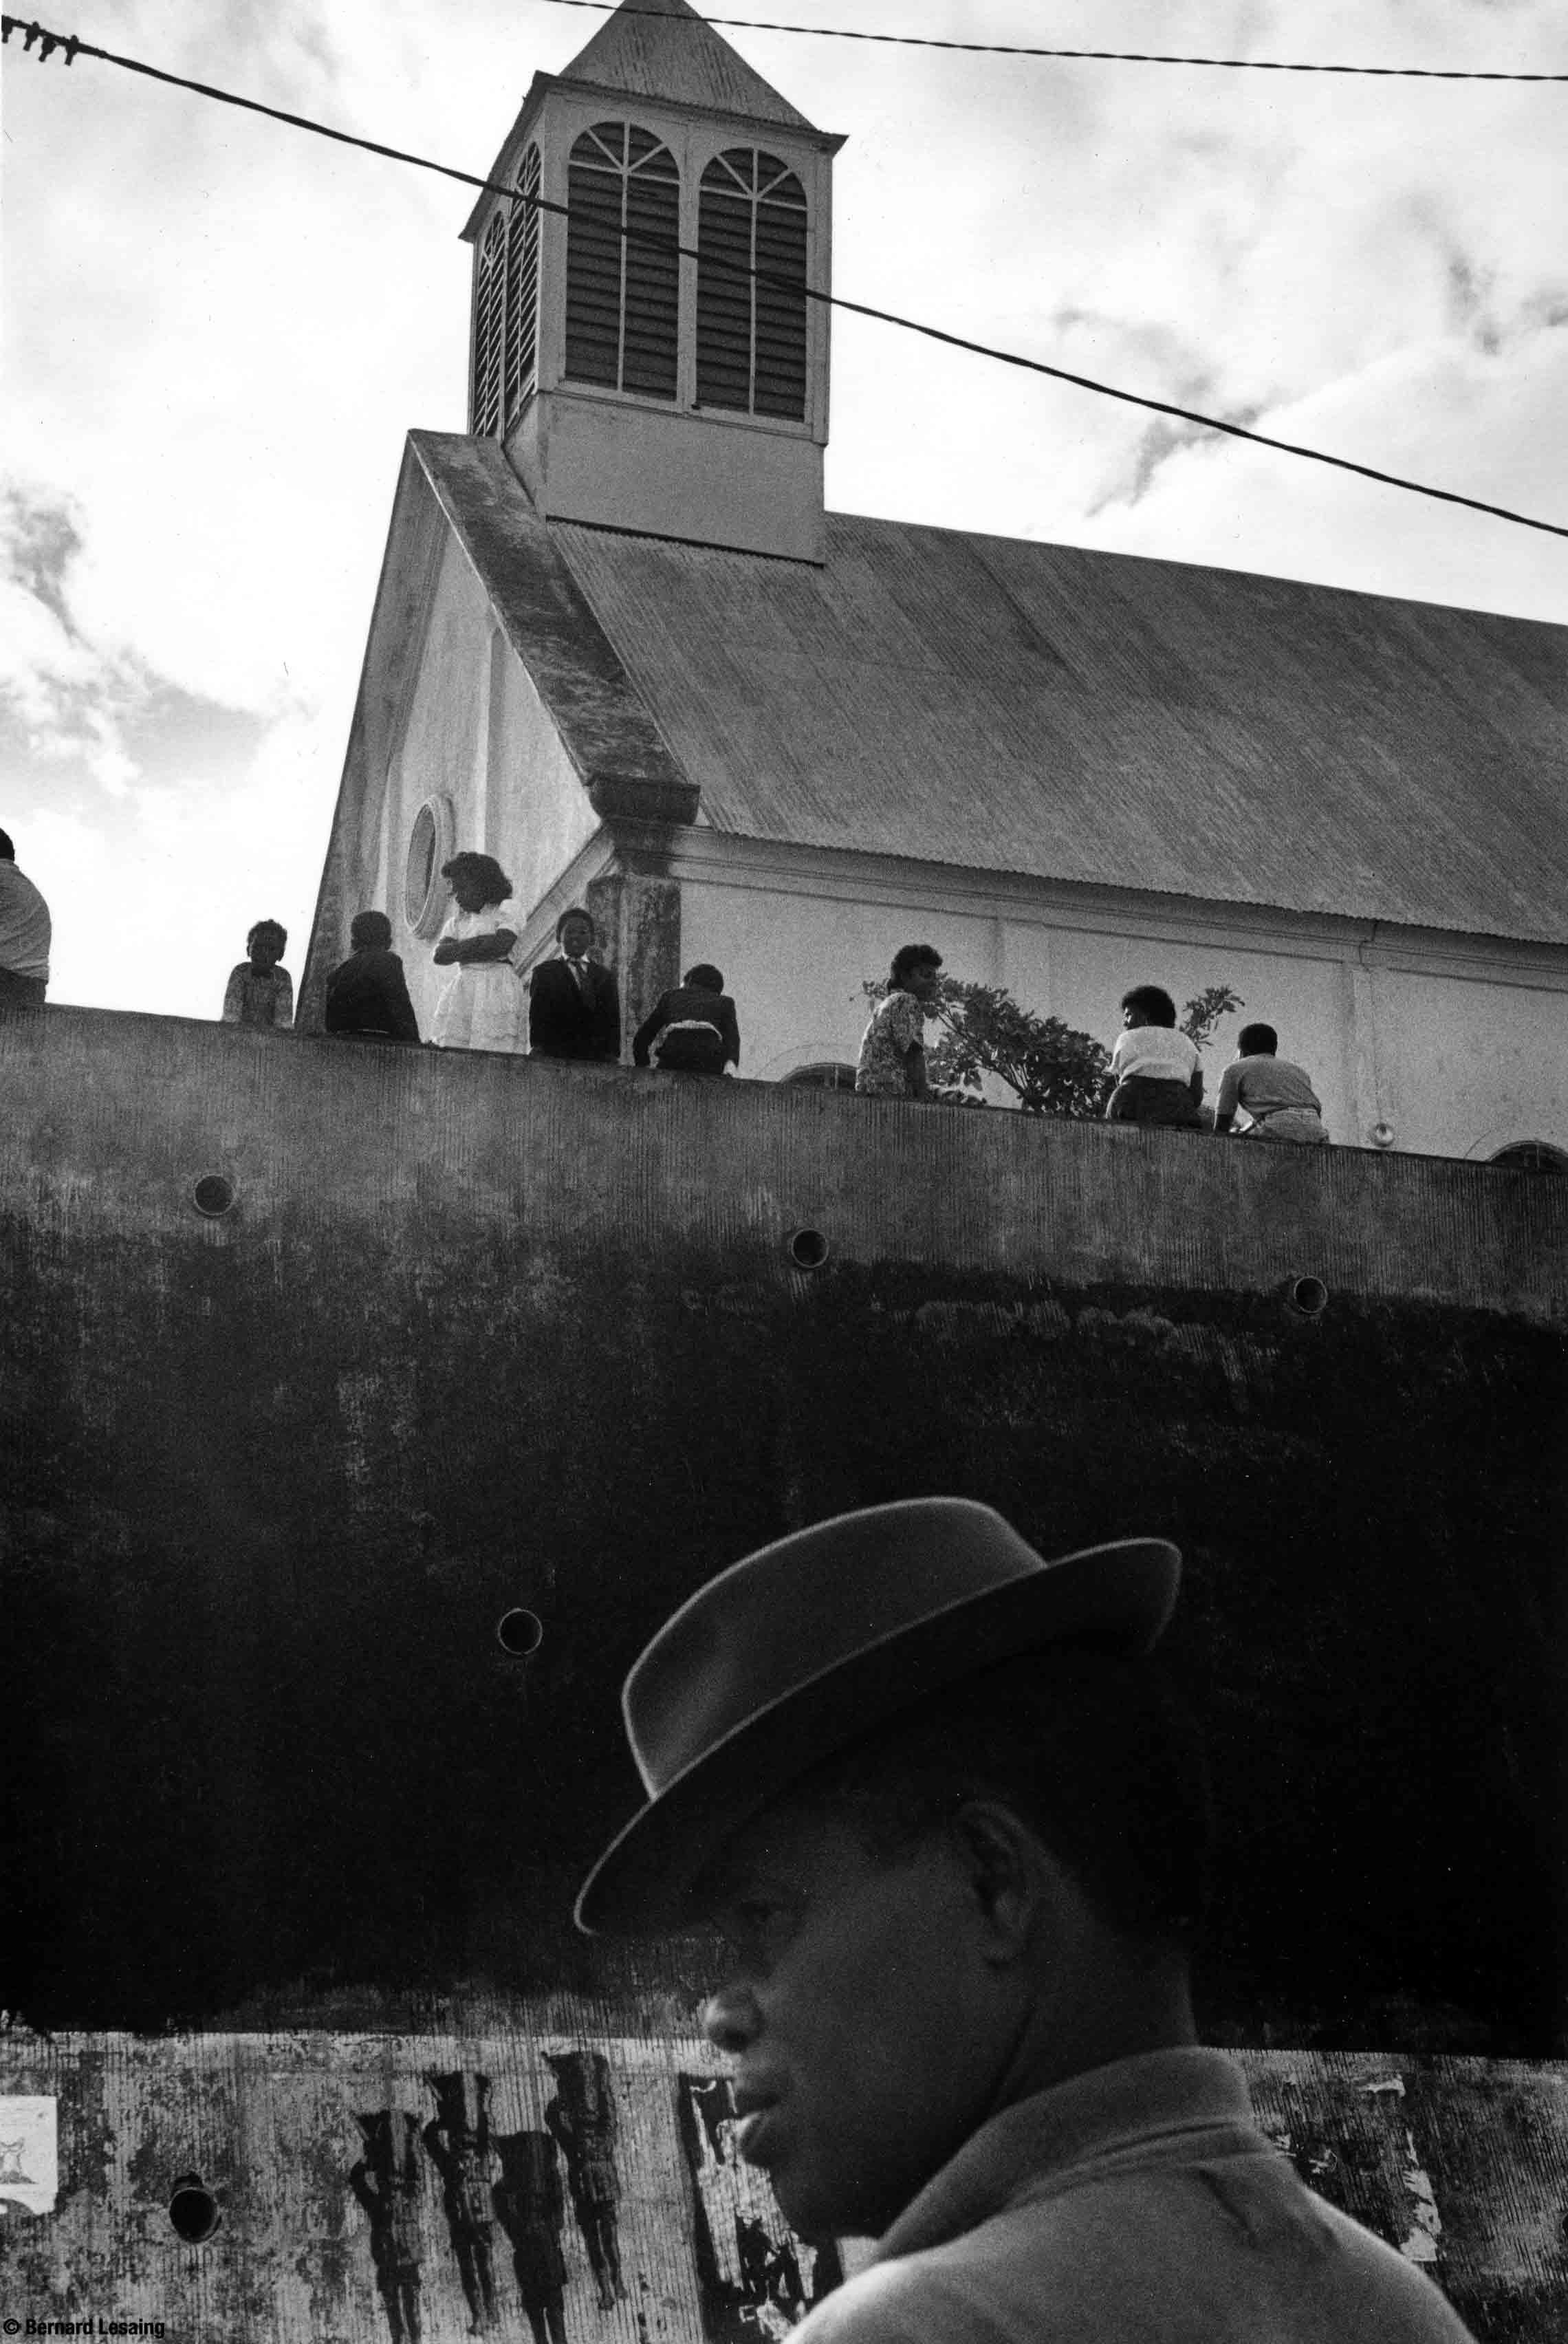 L'église de Piton Saint-Leu, 90's © Bernard Lesaing